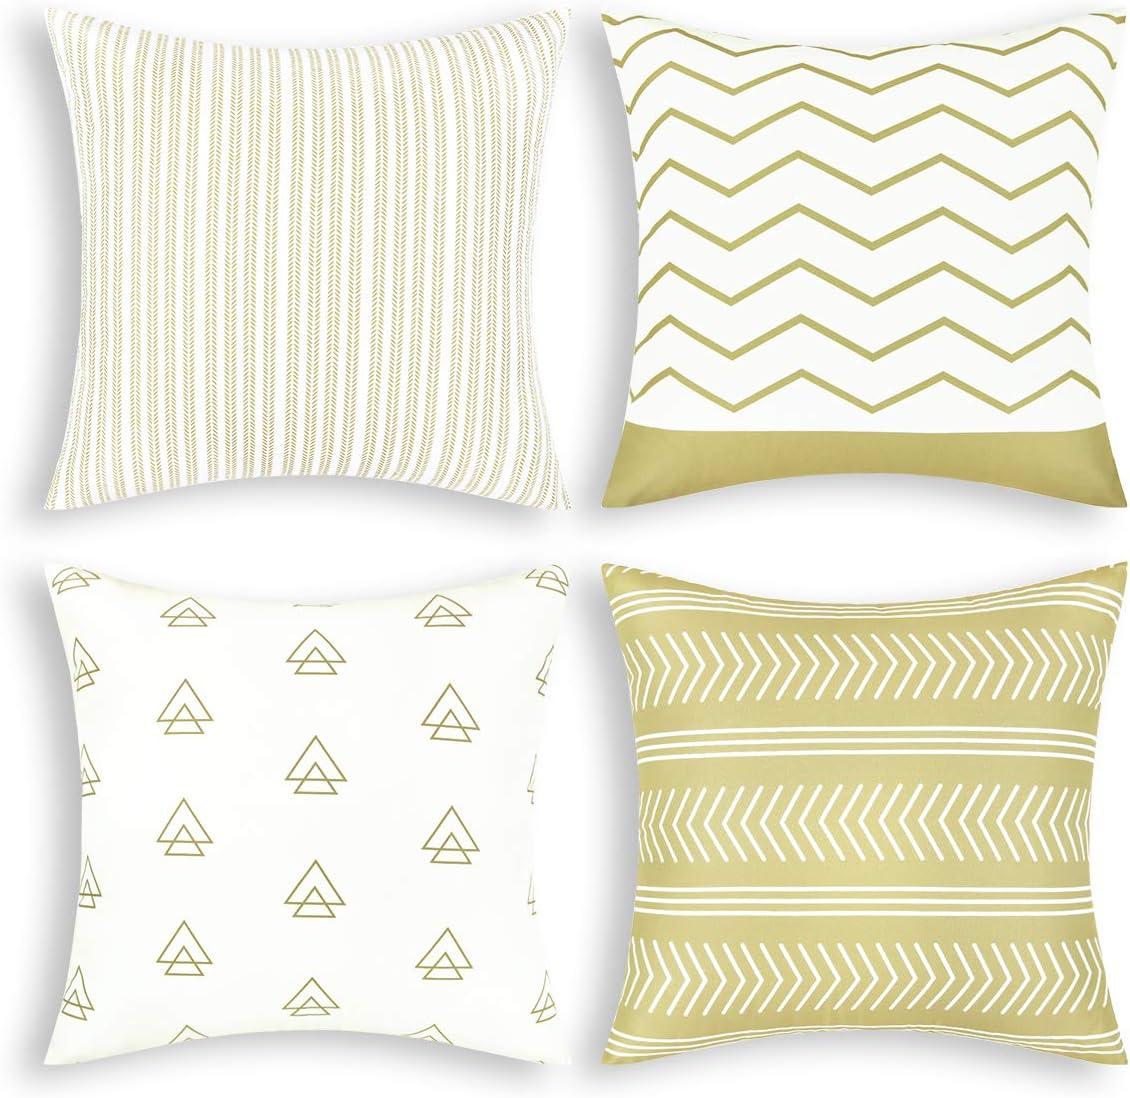 Amazon Com Fascidorm Set Of 4 Pillow Covers Throw Pillow Case 18 X 18 Inch Decorations Sofa Throw Pillow Case Cushion Covers Zippered Pillowcase Khaki 18 X 18 Home Kitchen